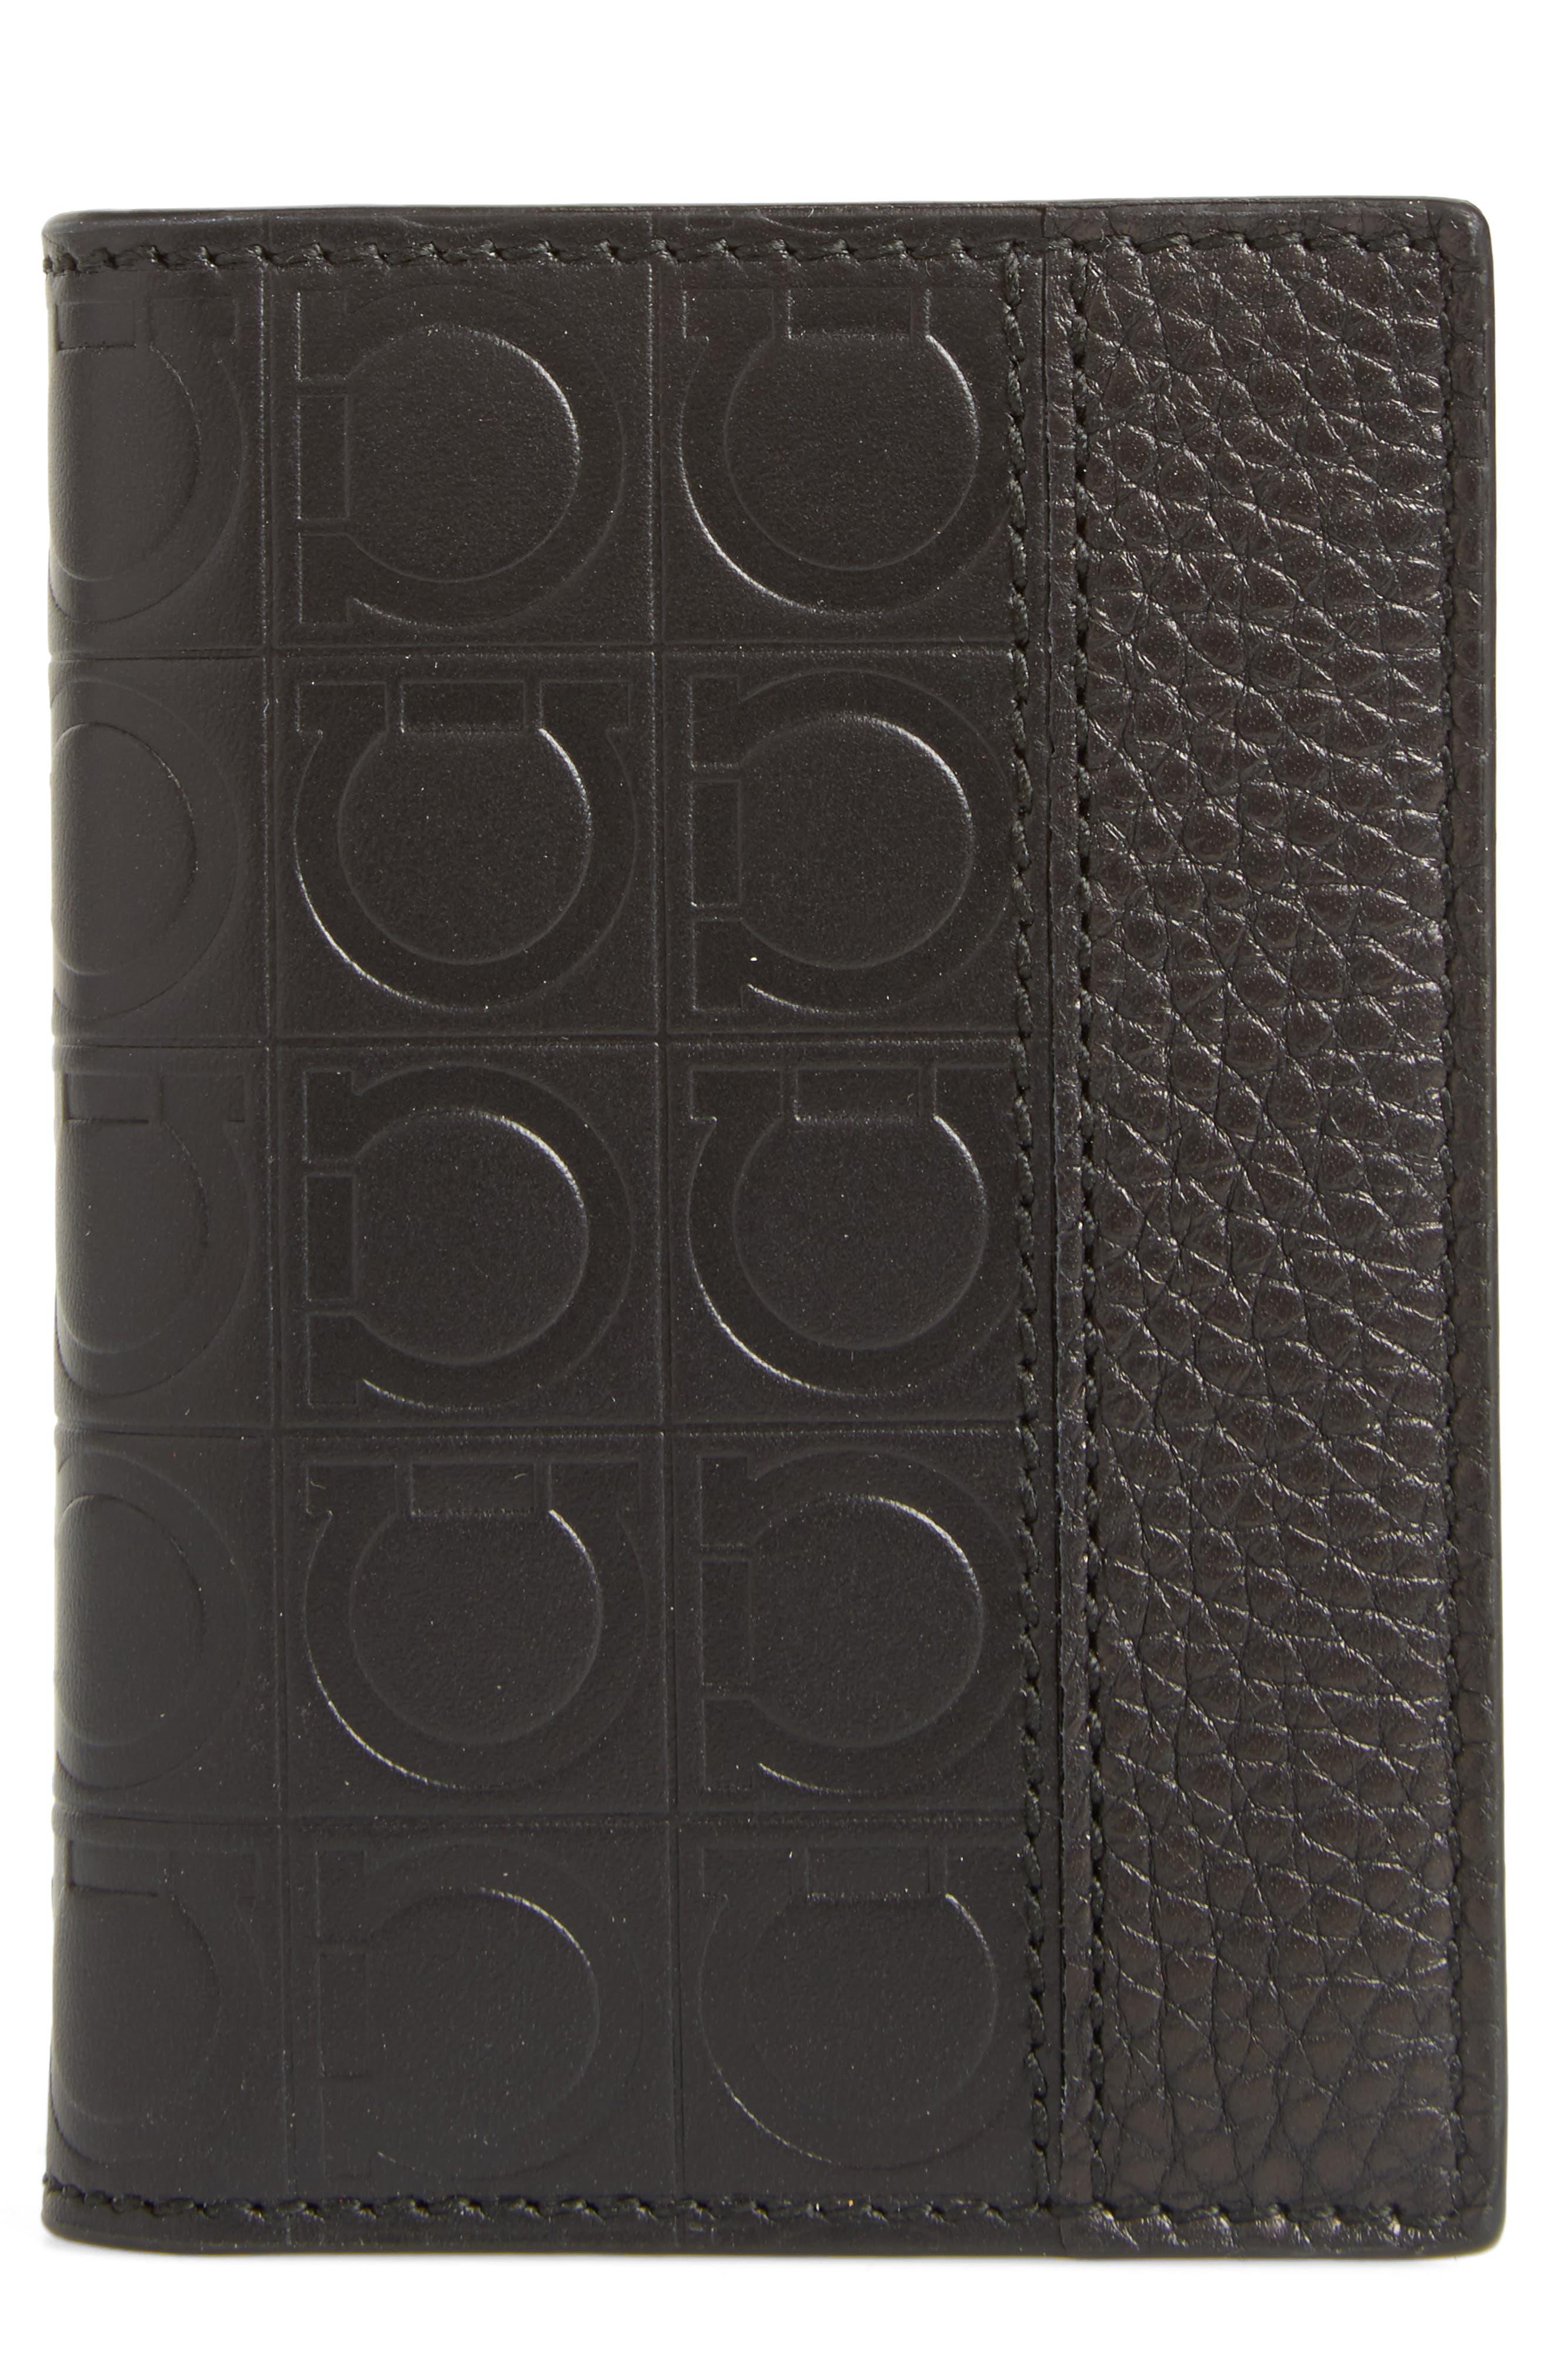 Salvatore Ferragamo Firenze Leather Folding Card Case